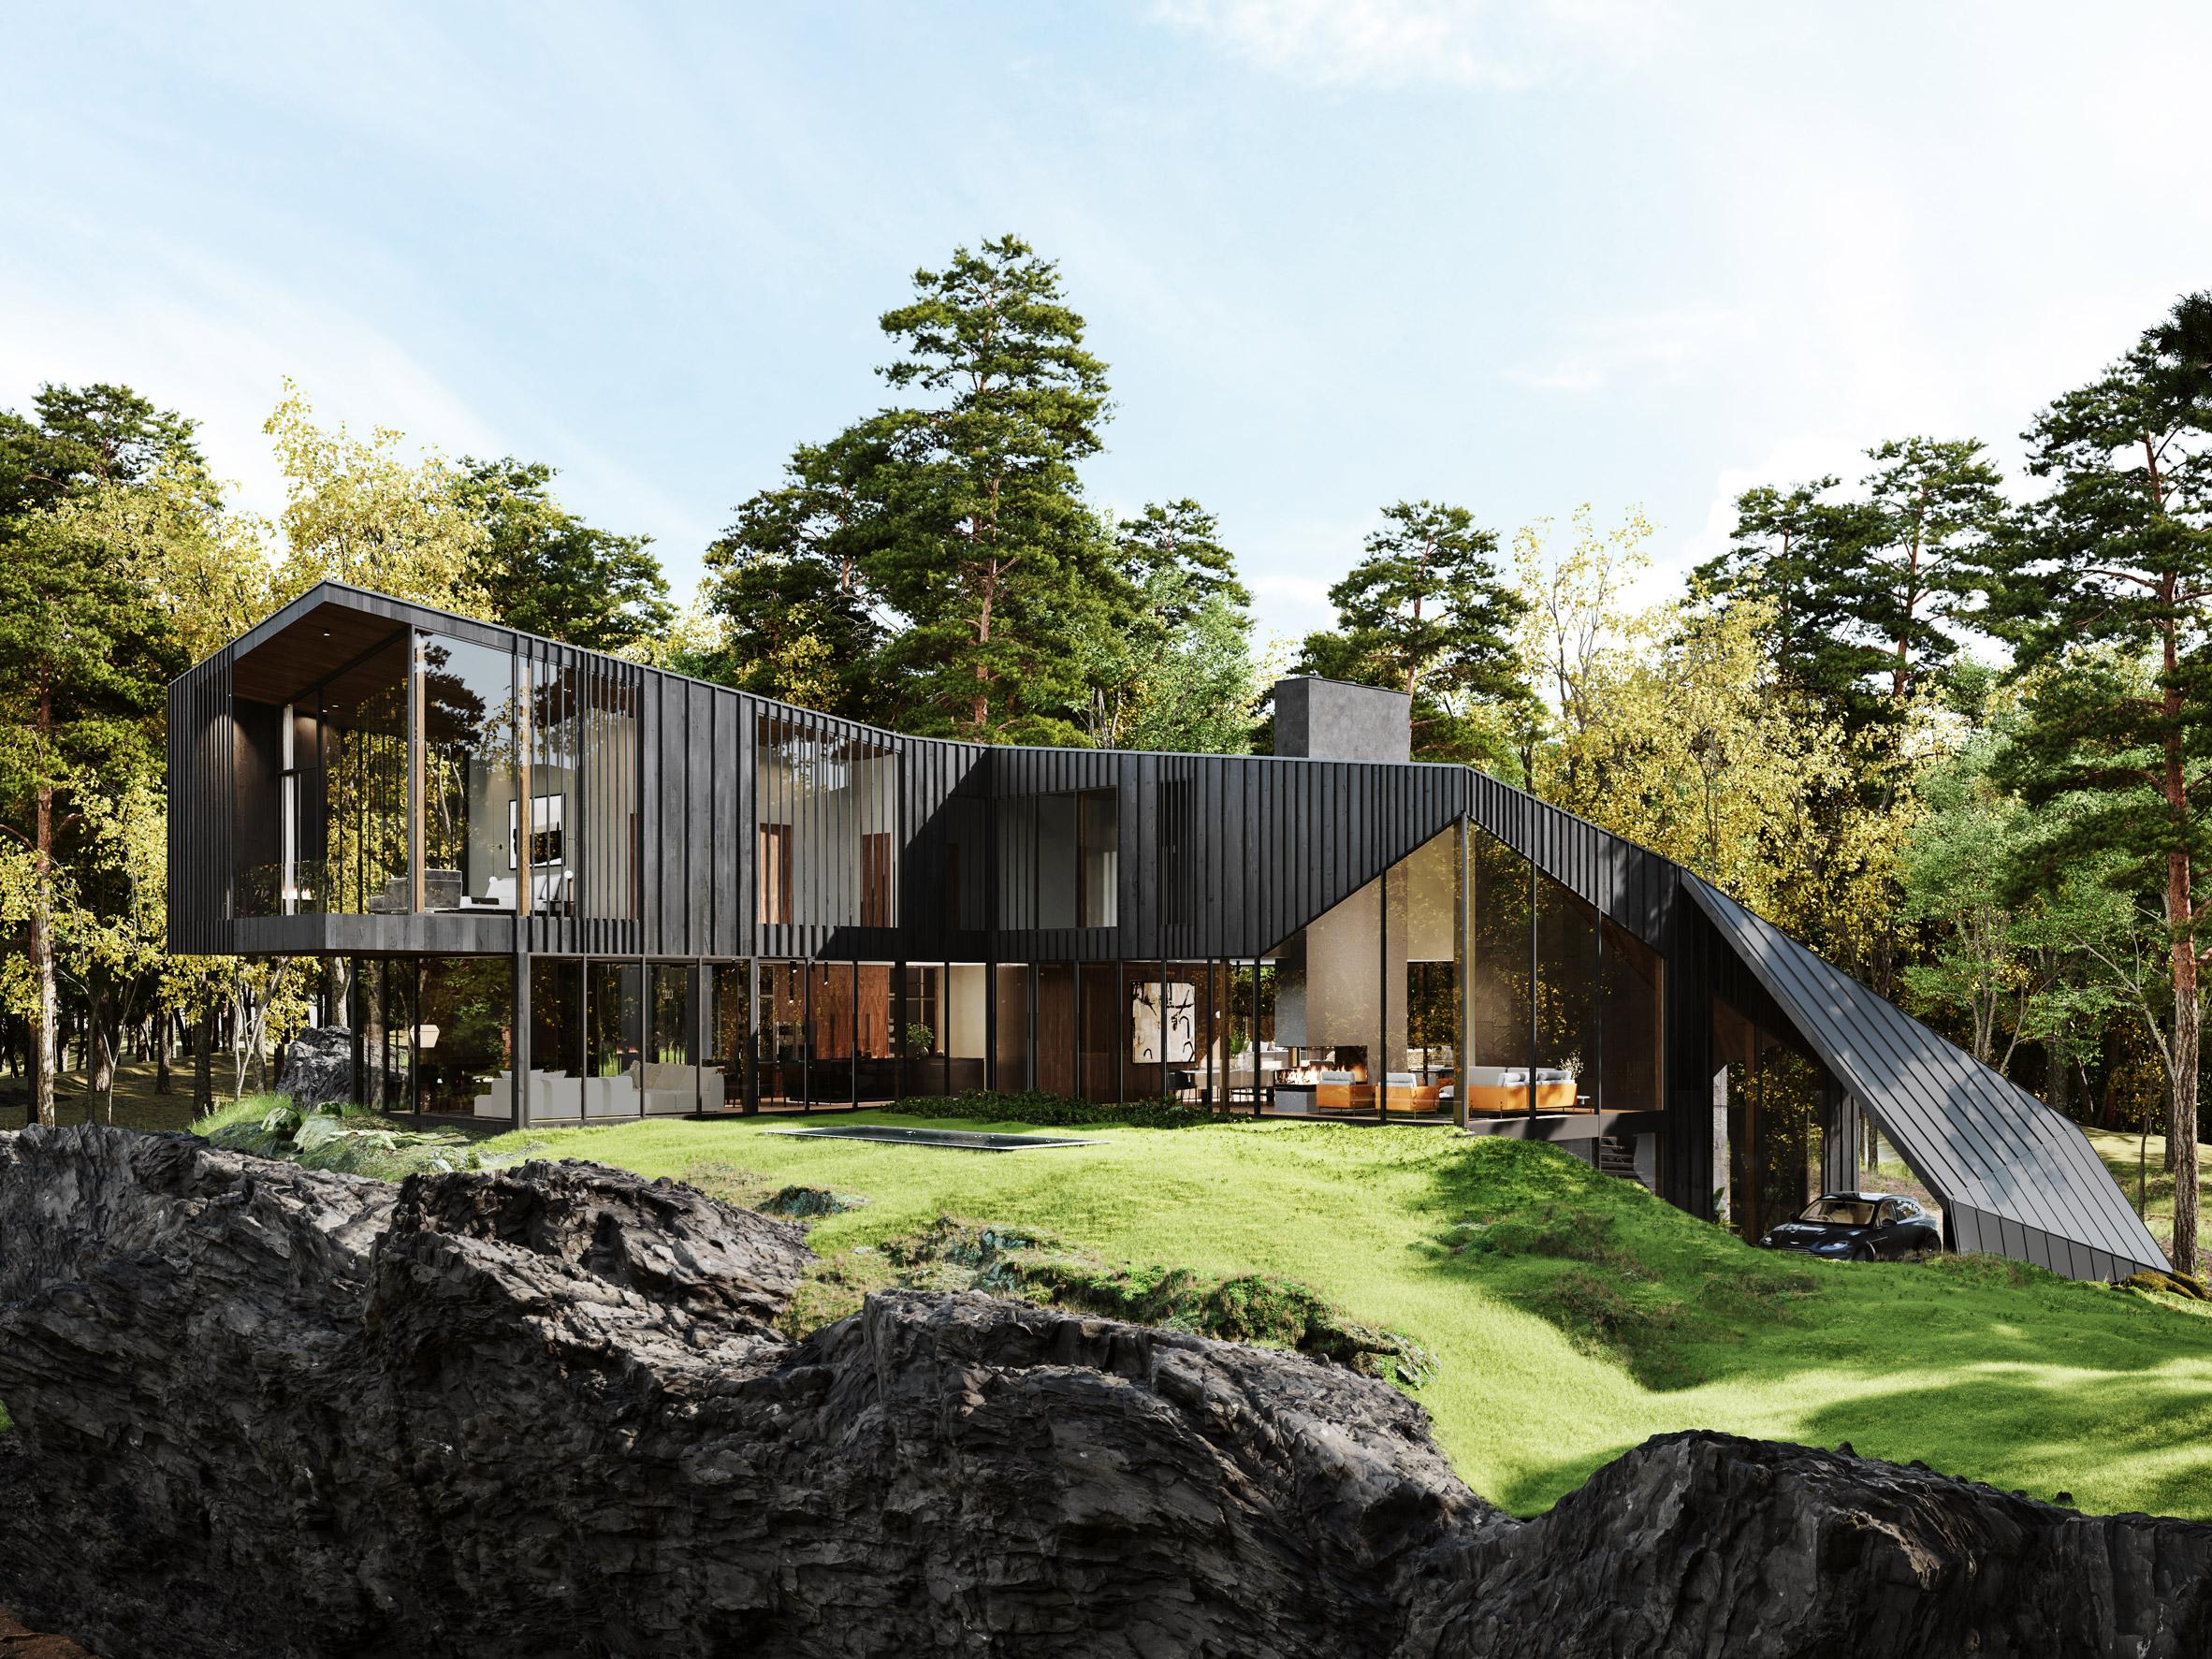 Exterior da casa / S3 Architecture/Corcoran Country Living